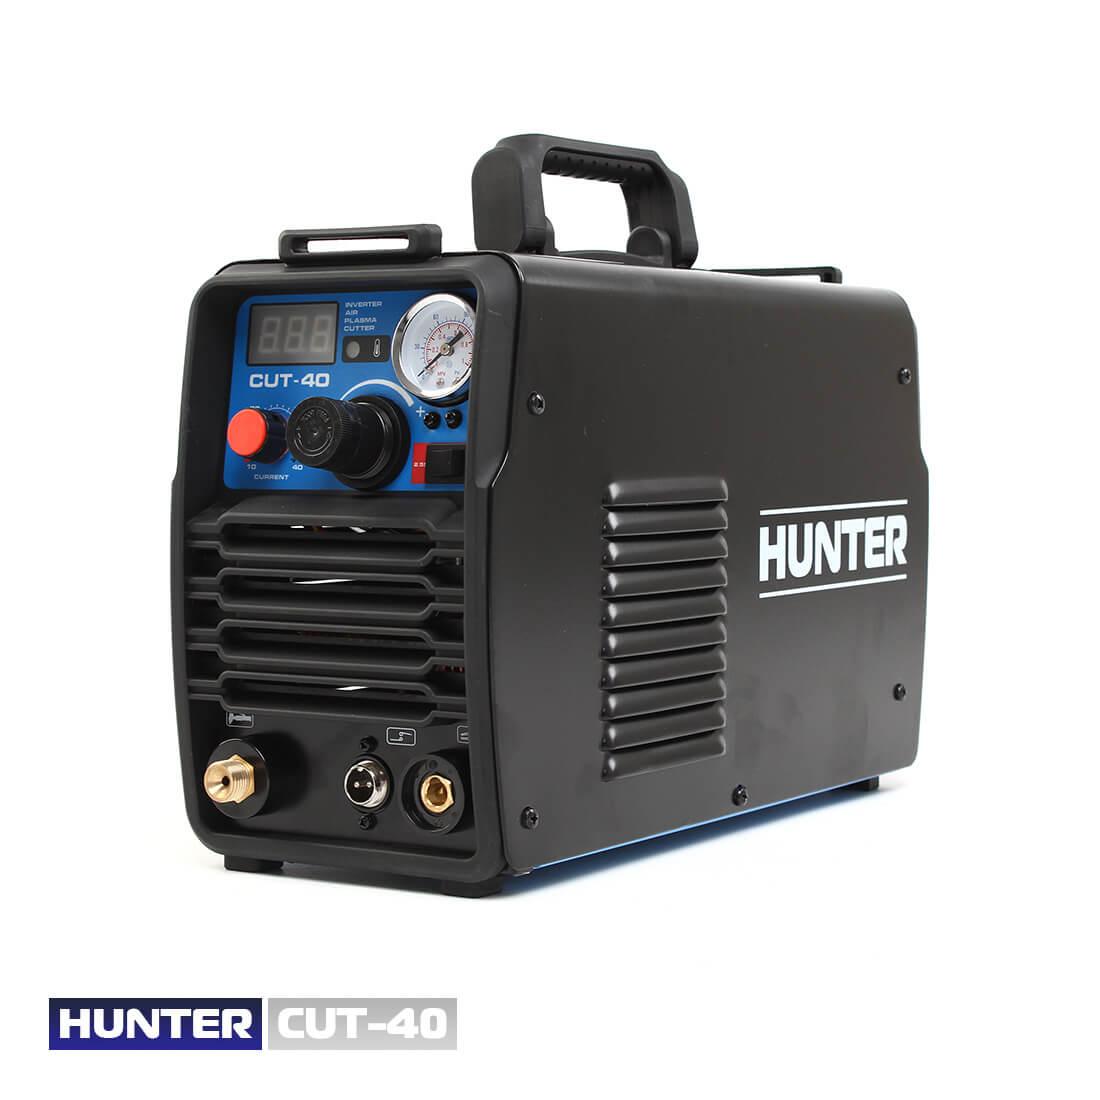 Фото Hunter CUT-40 (плазморез) цена 6350грн №5 — Hunter